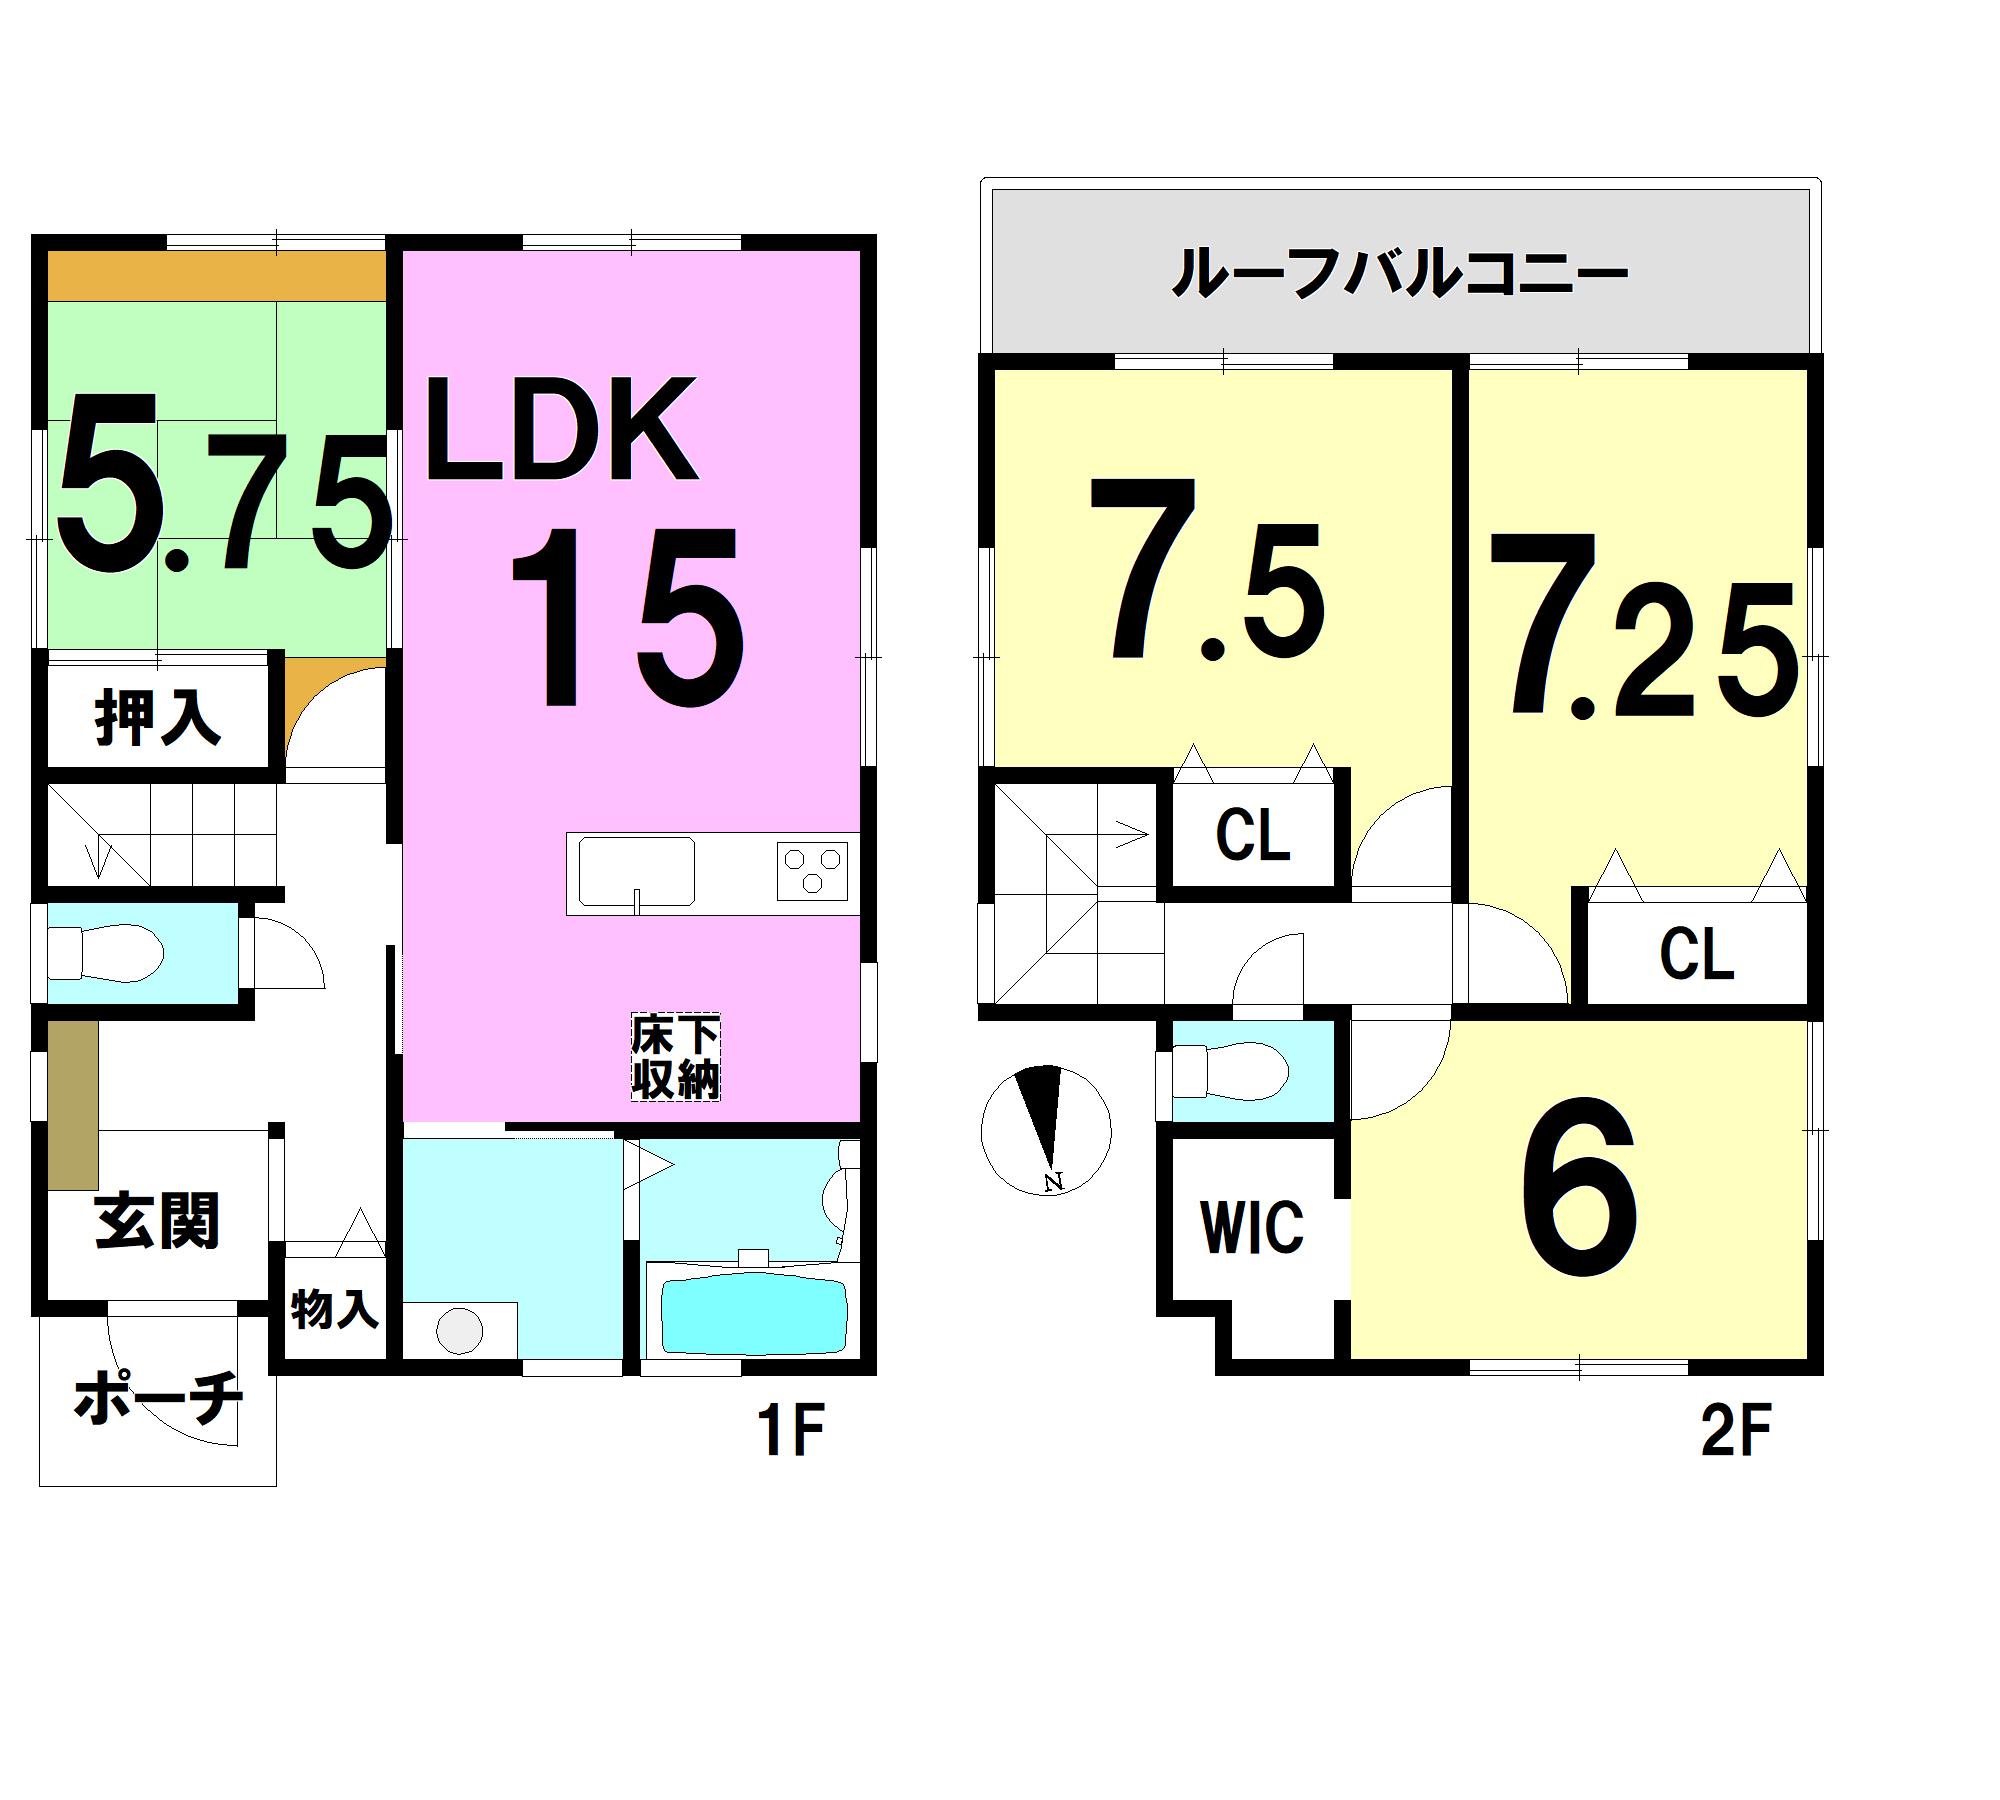 【間取り】 1F:15LDK 5.75和 2F:7.5洋 7.25洋 6洋 WIC